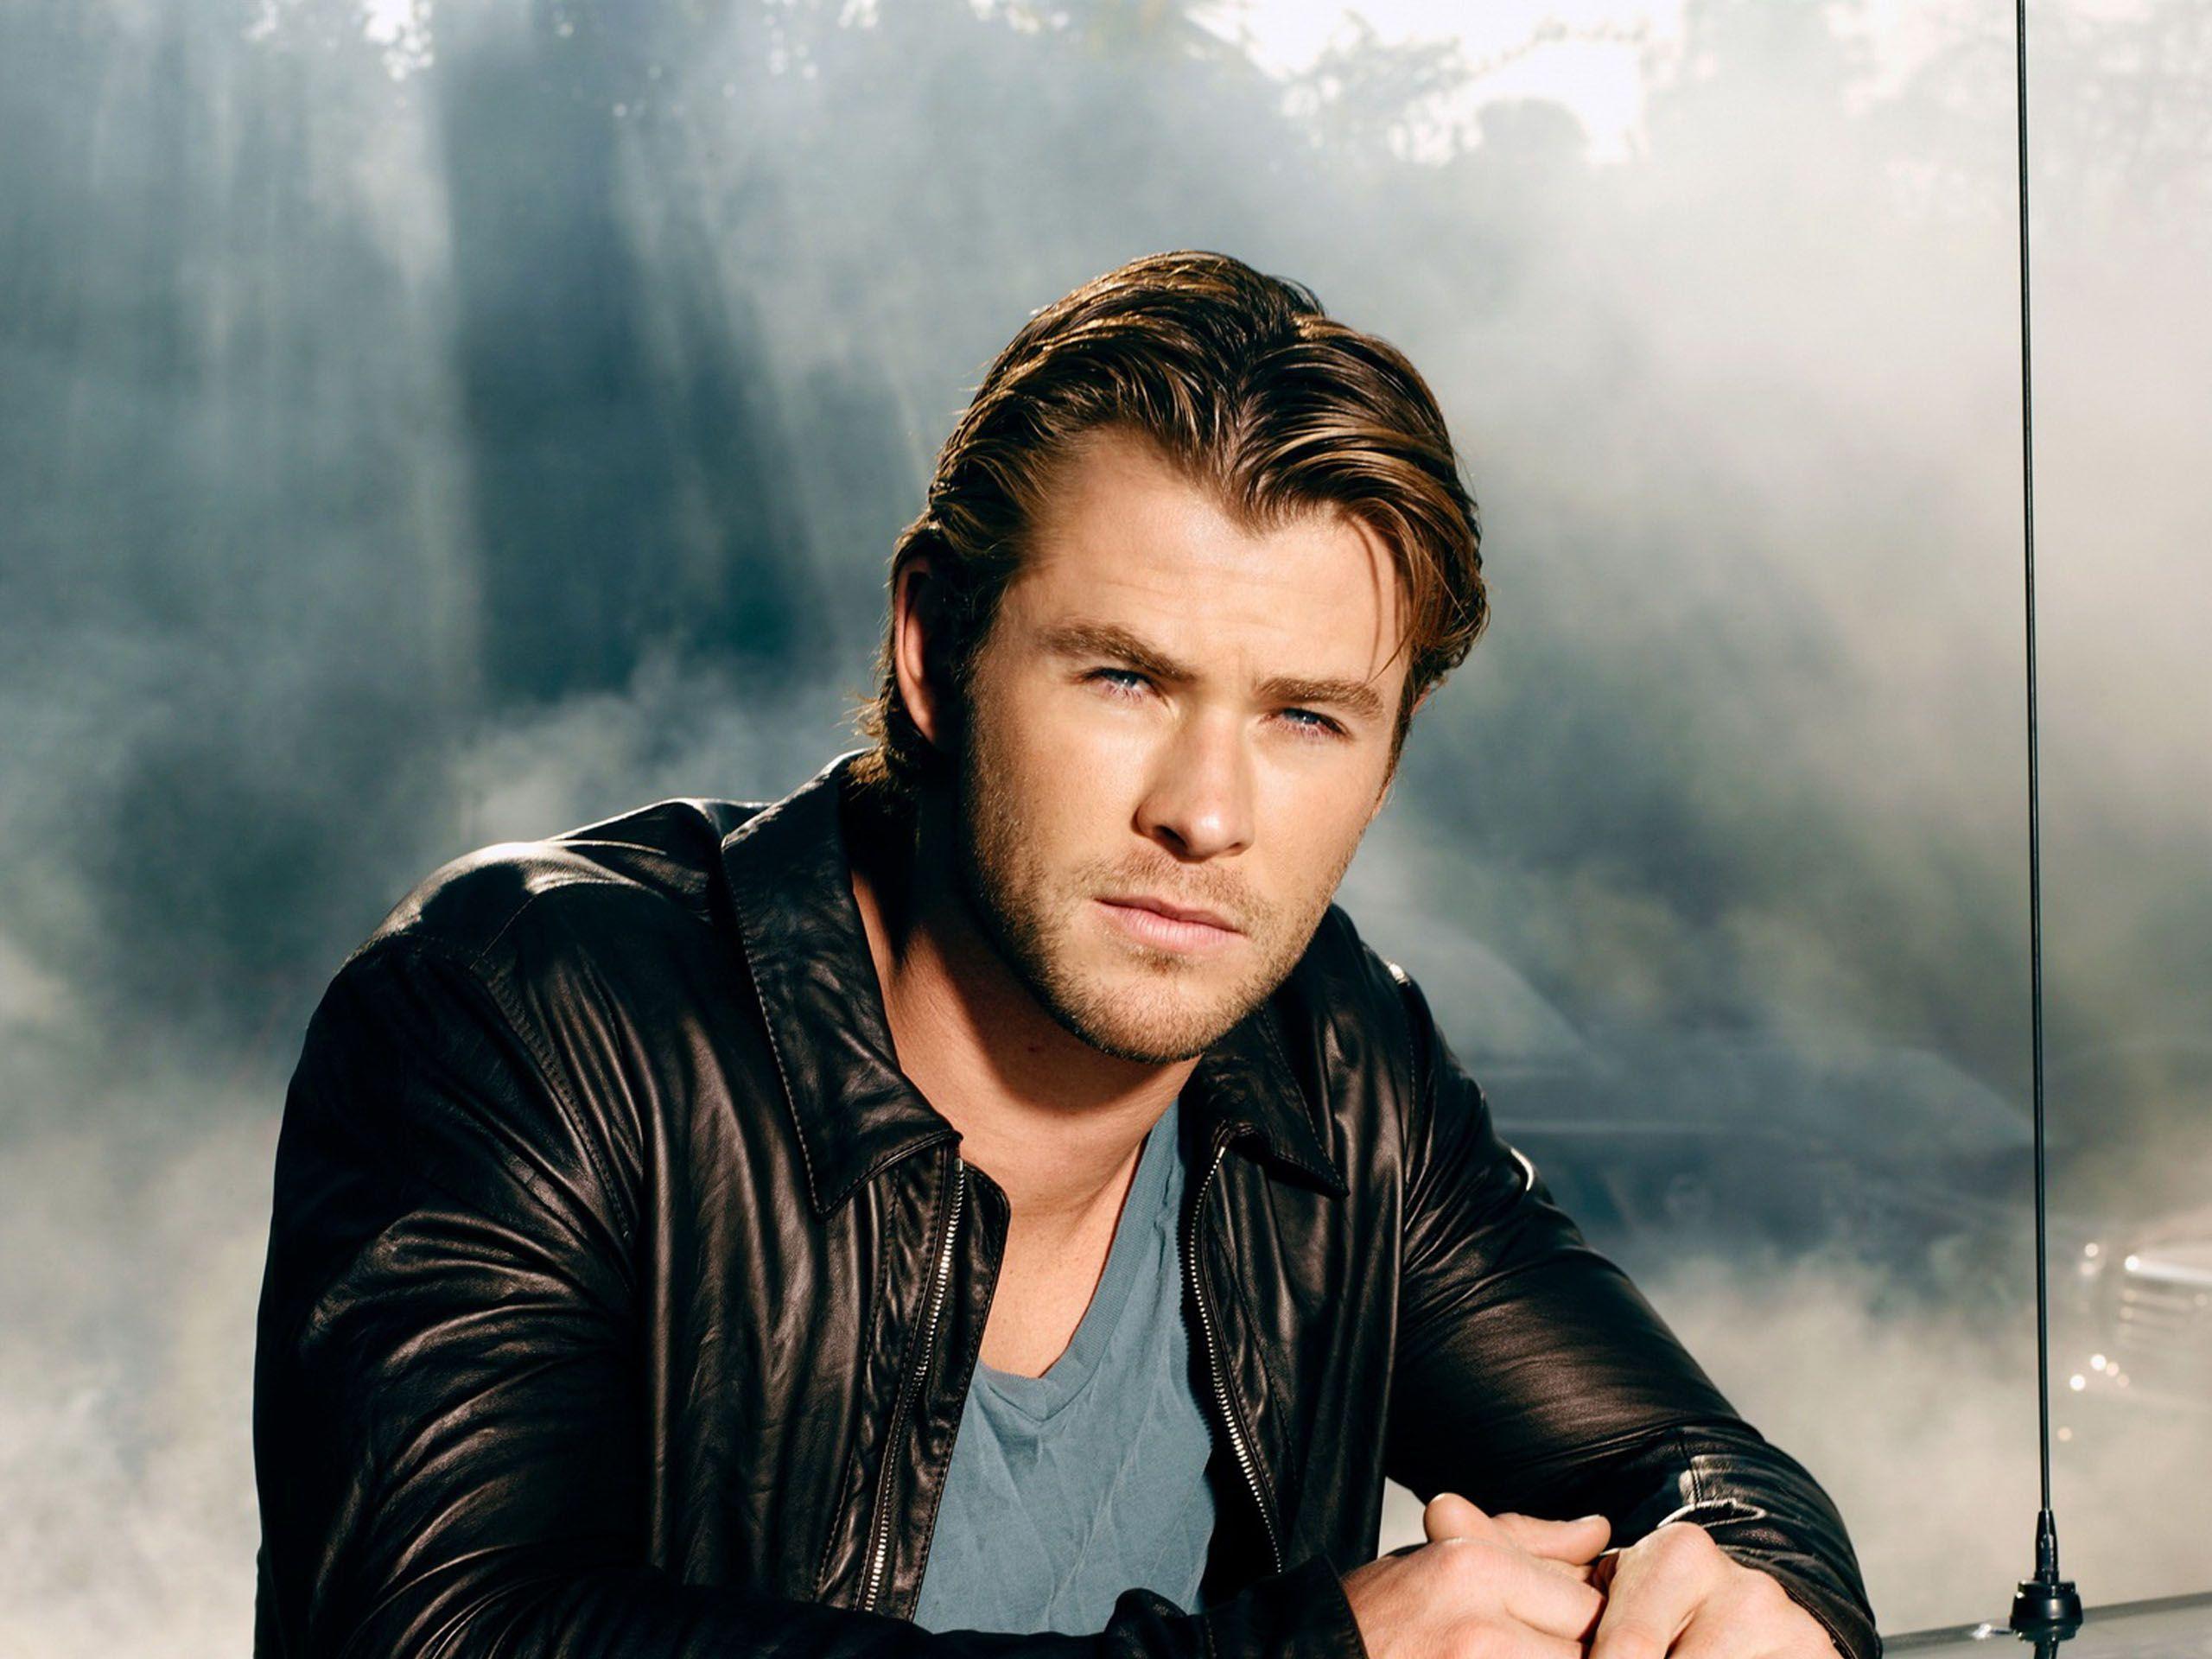 Chris Hemsworth Wallpapers 2560x1920